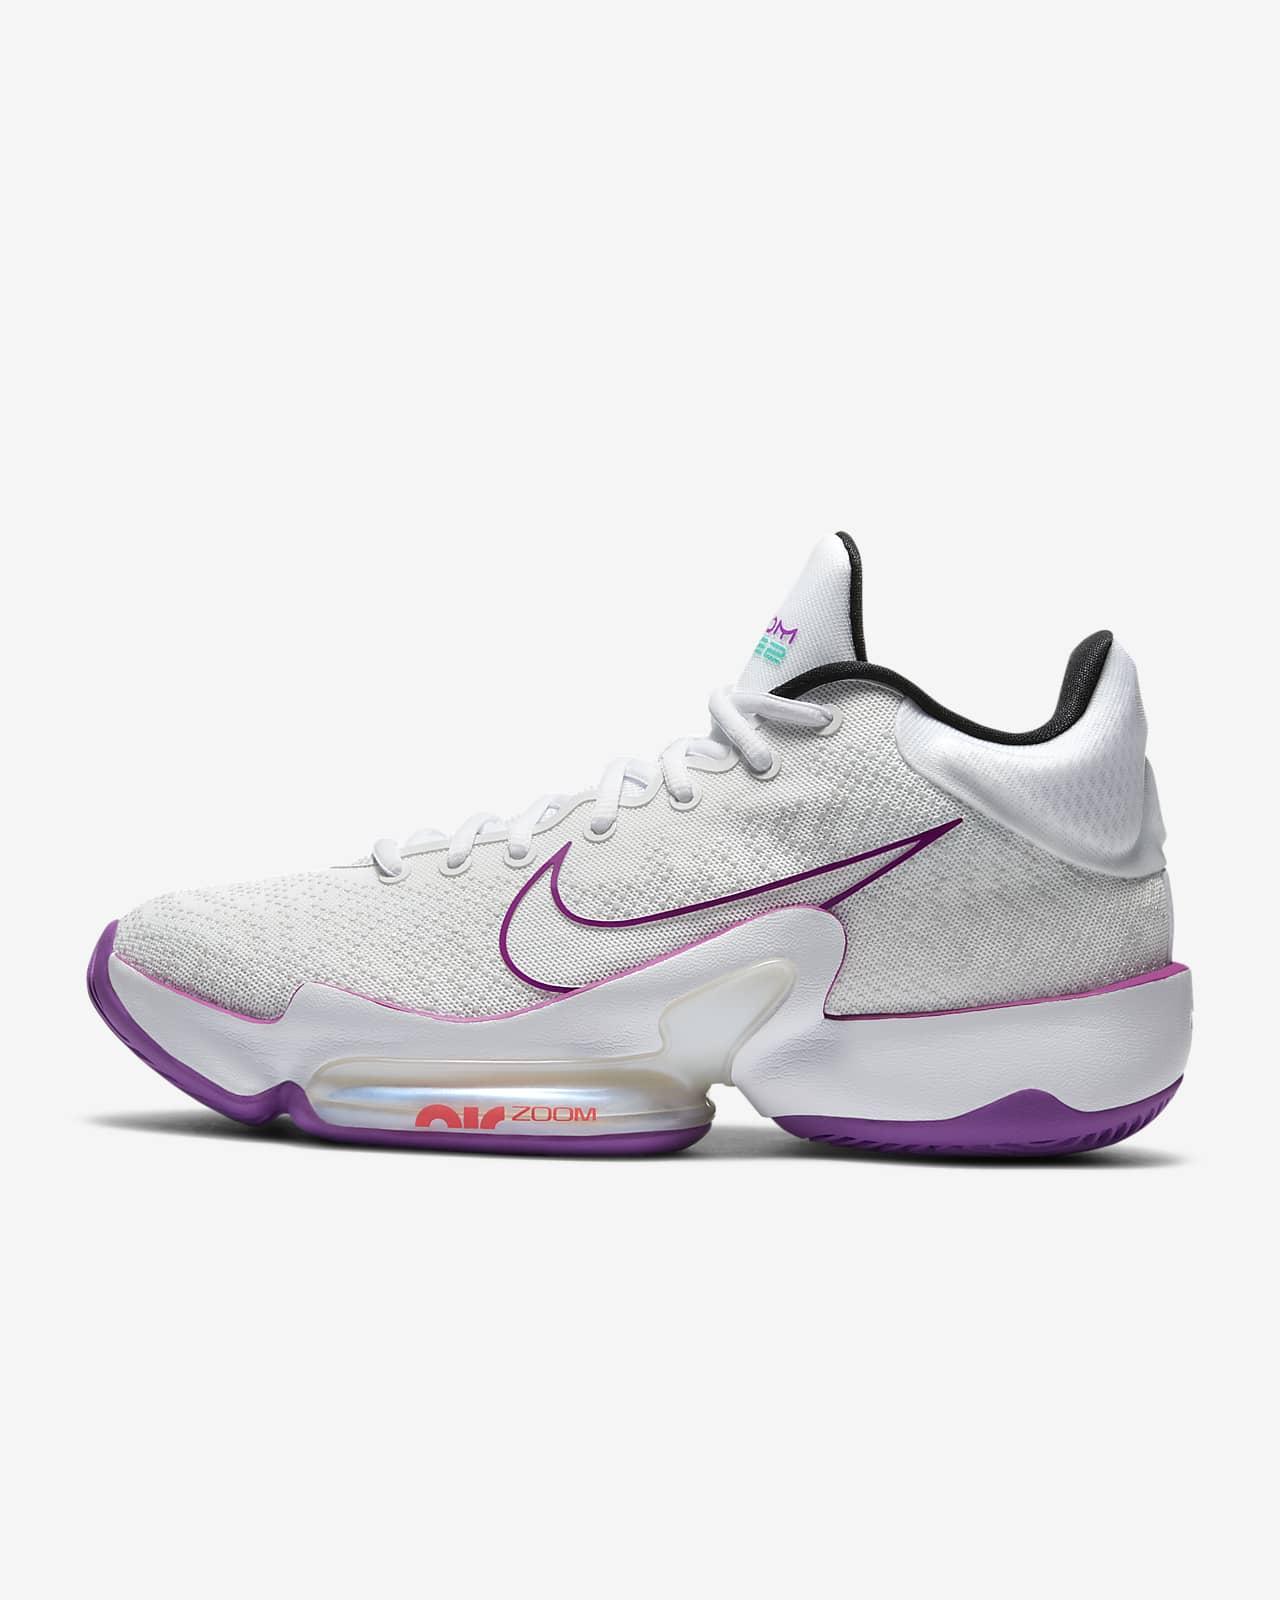 Nike Zoom Rize 2 籃球鞋